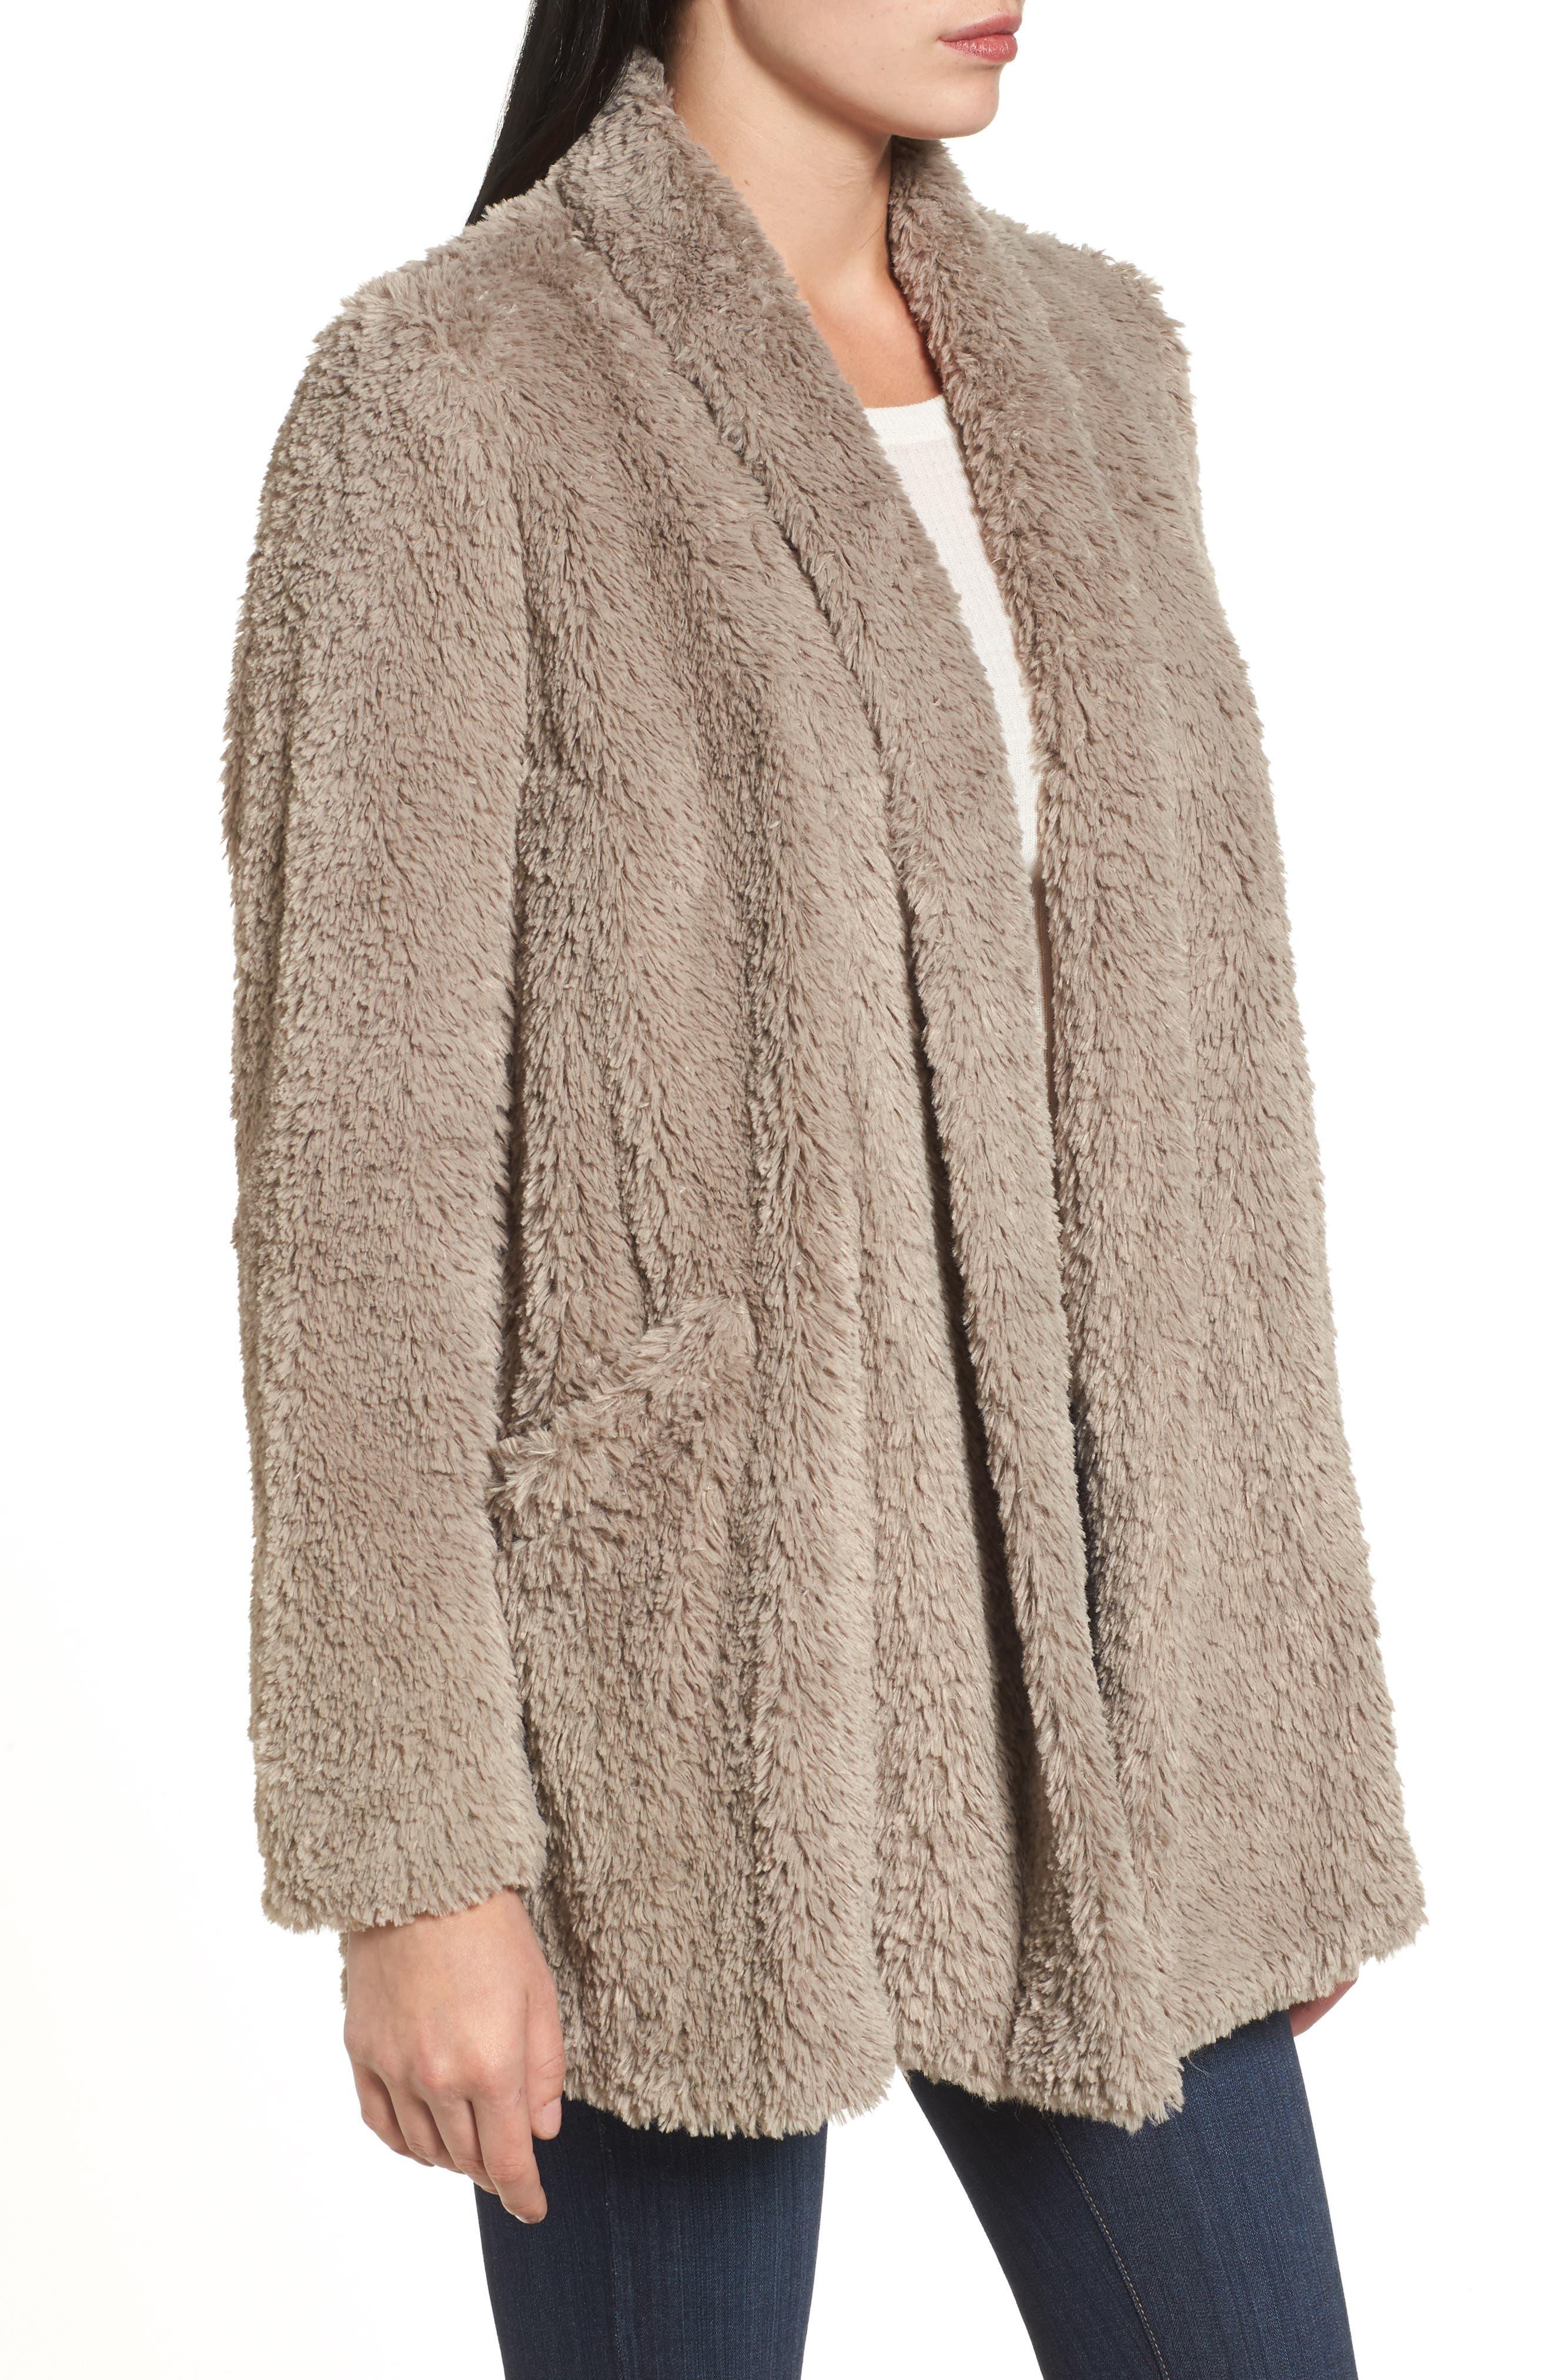 'Teddy Bear' Faux Fur Clutch Coat,                             Alternate thumbnail 3, color,                             Natural